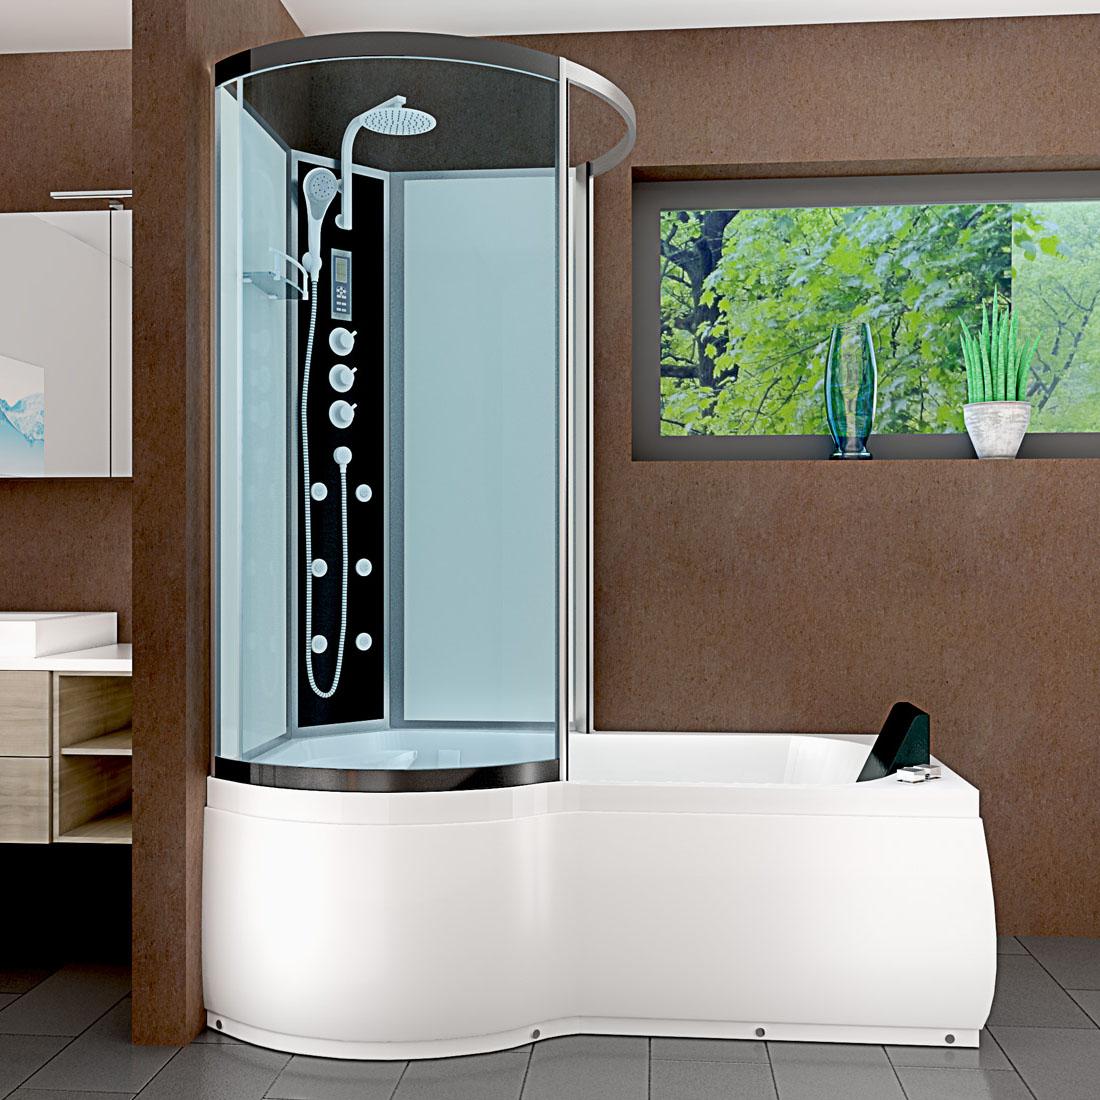 acquavapore dtp8050 a007r whirlpool wanne duschtempel dusche duschkabine th 98x170. Black Bedroom Furniture Sets. Home Design Ideas